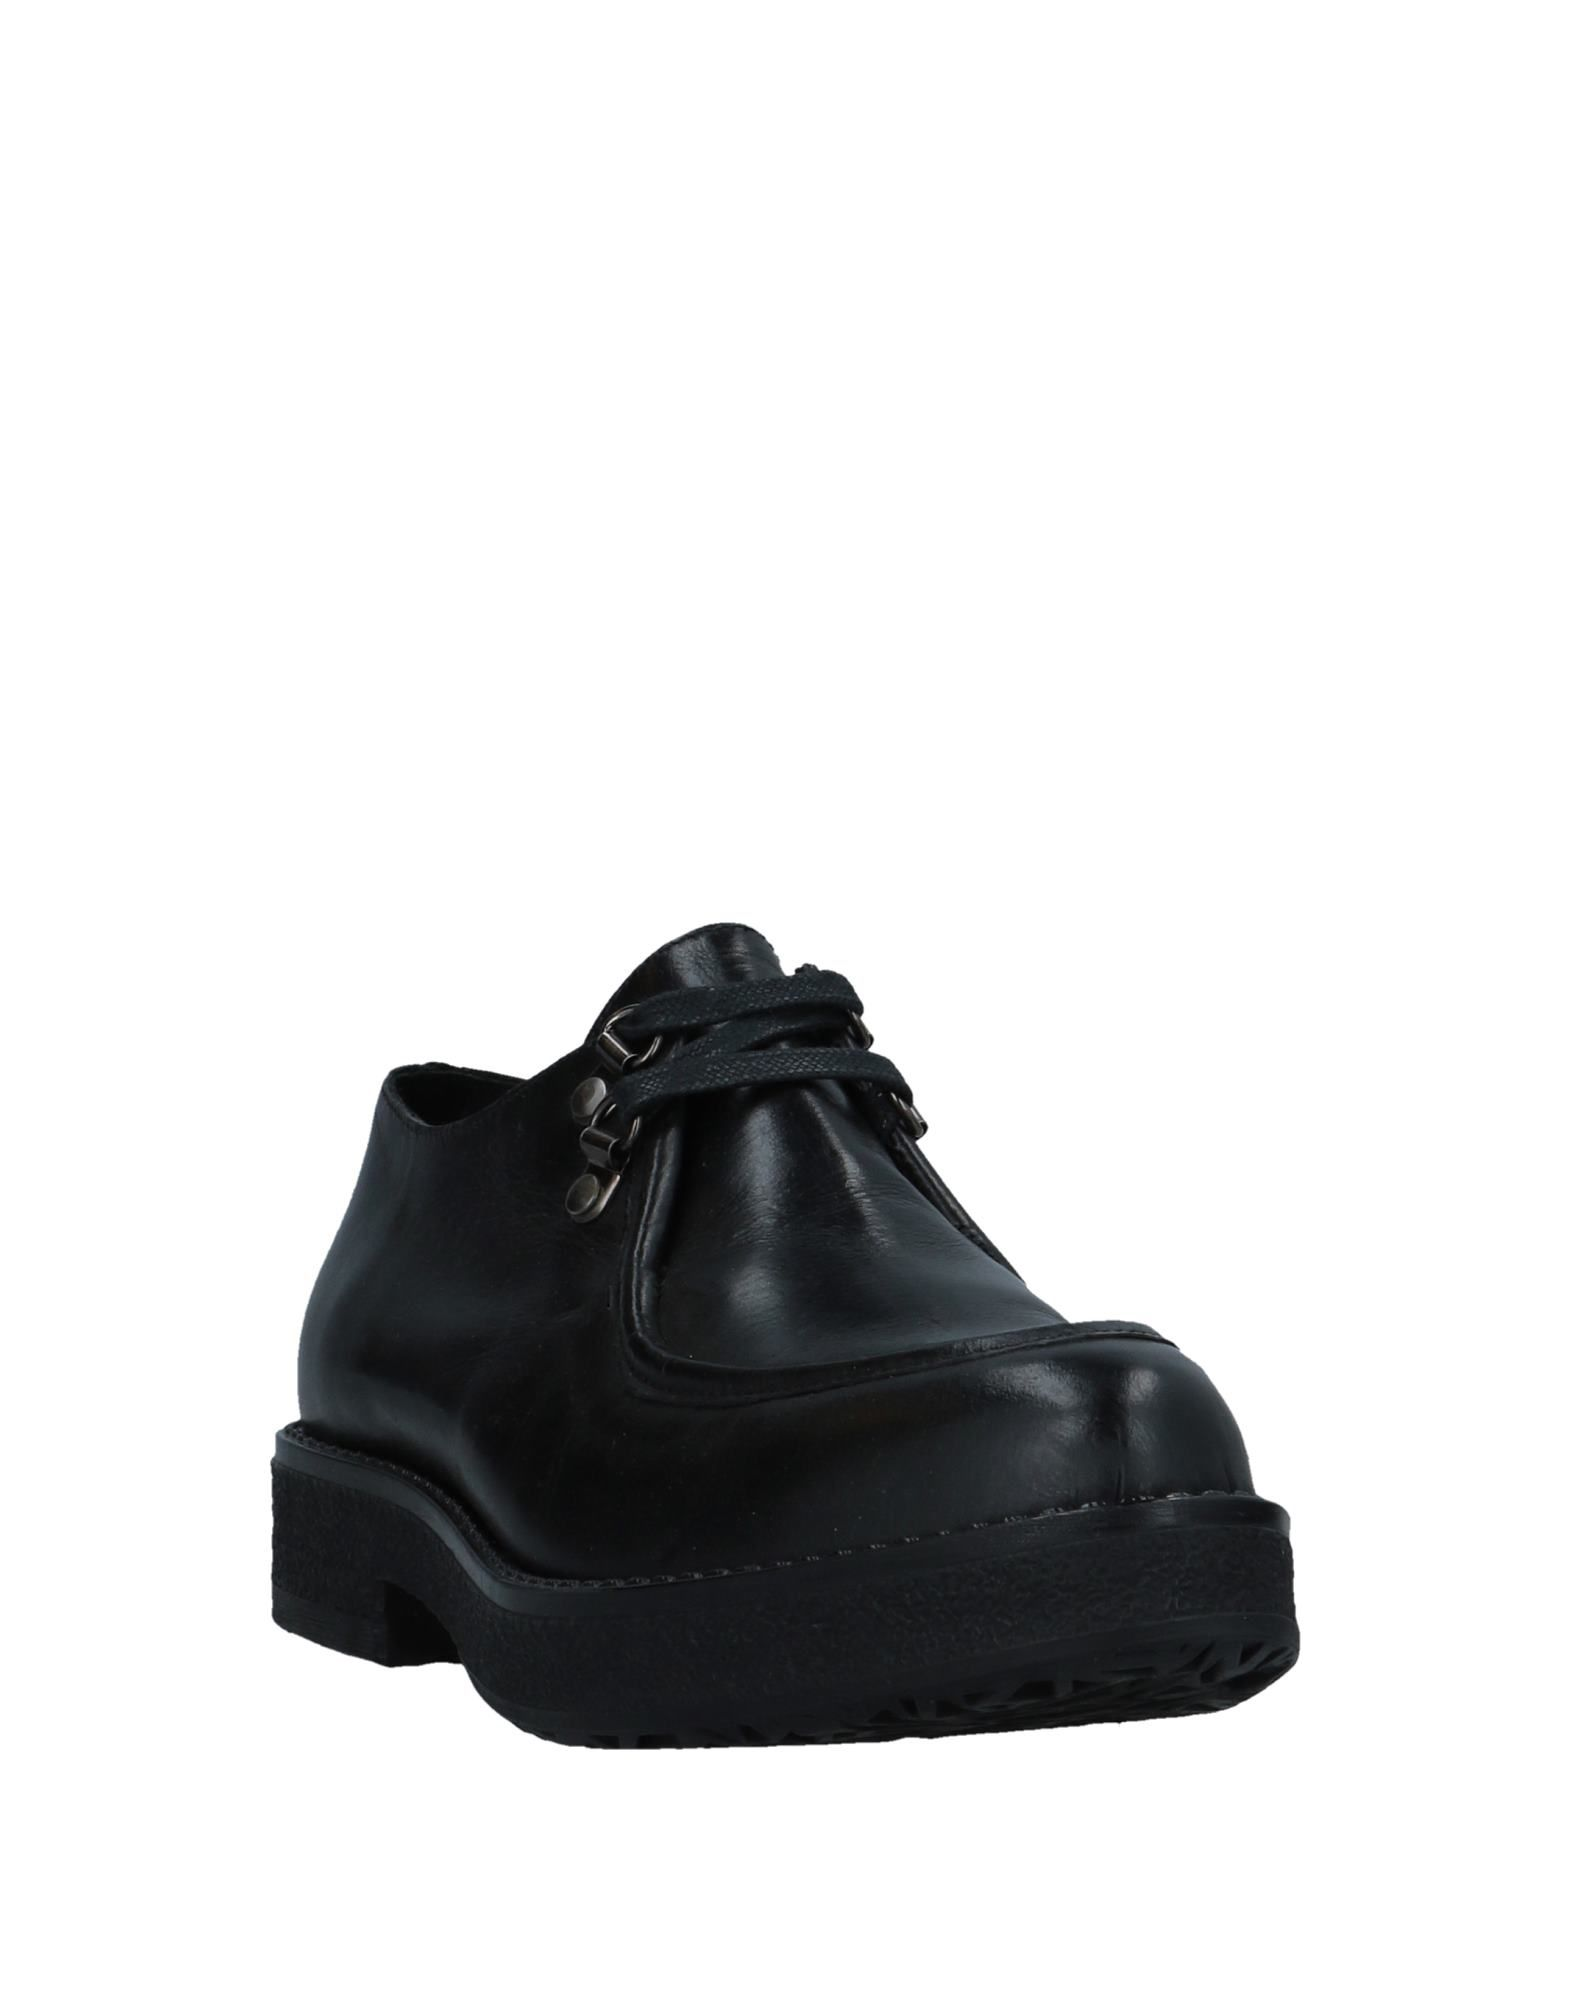 Stilvolle billige  Schuhe Chocolà Schnürschuhe Damen  billige 11529772MT 324a50